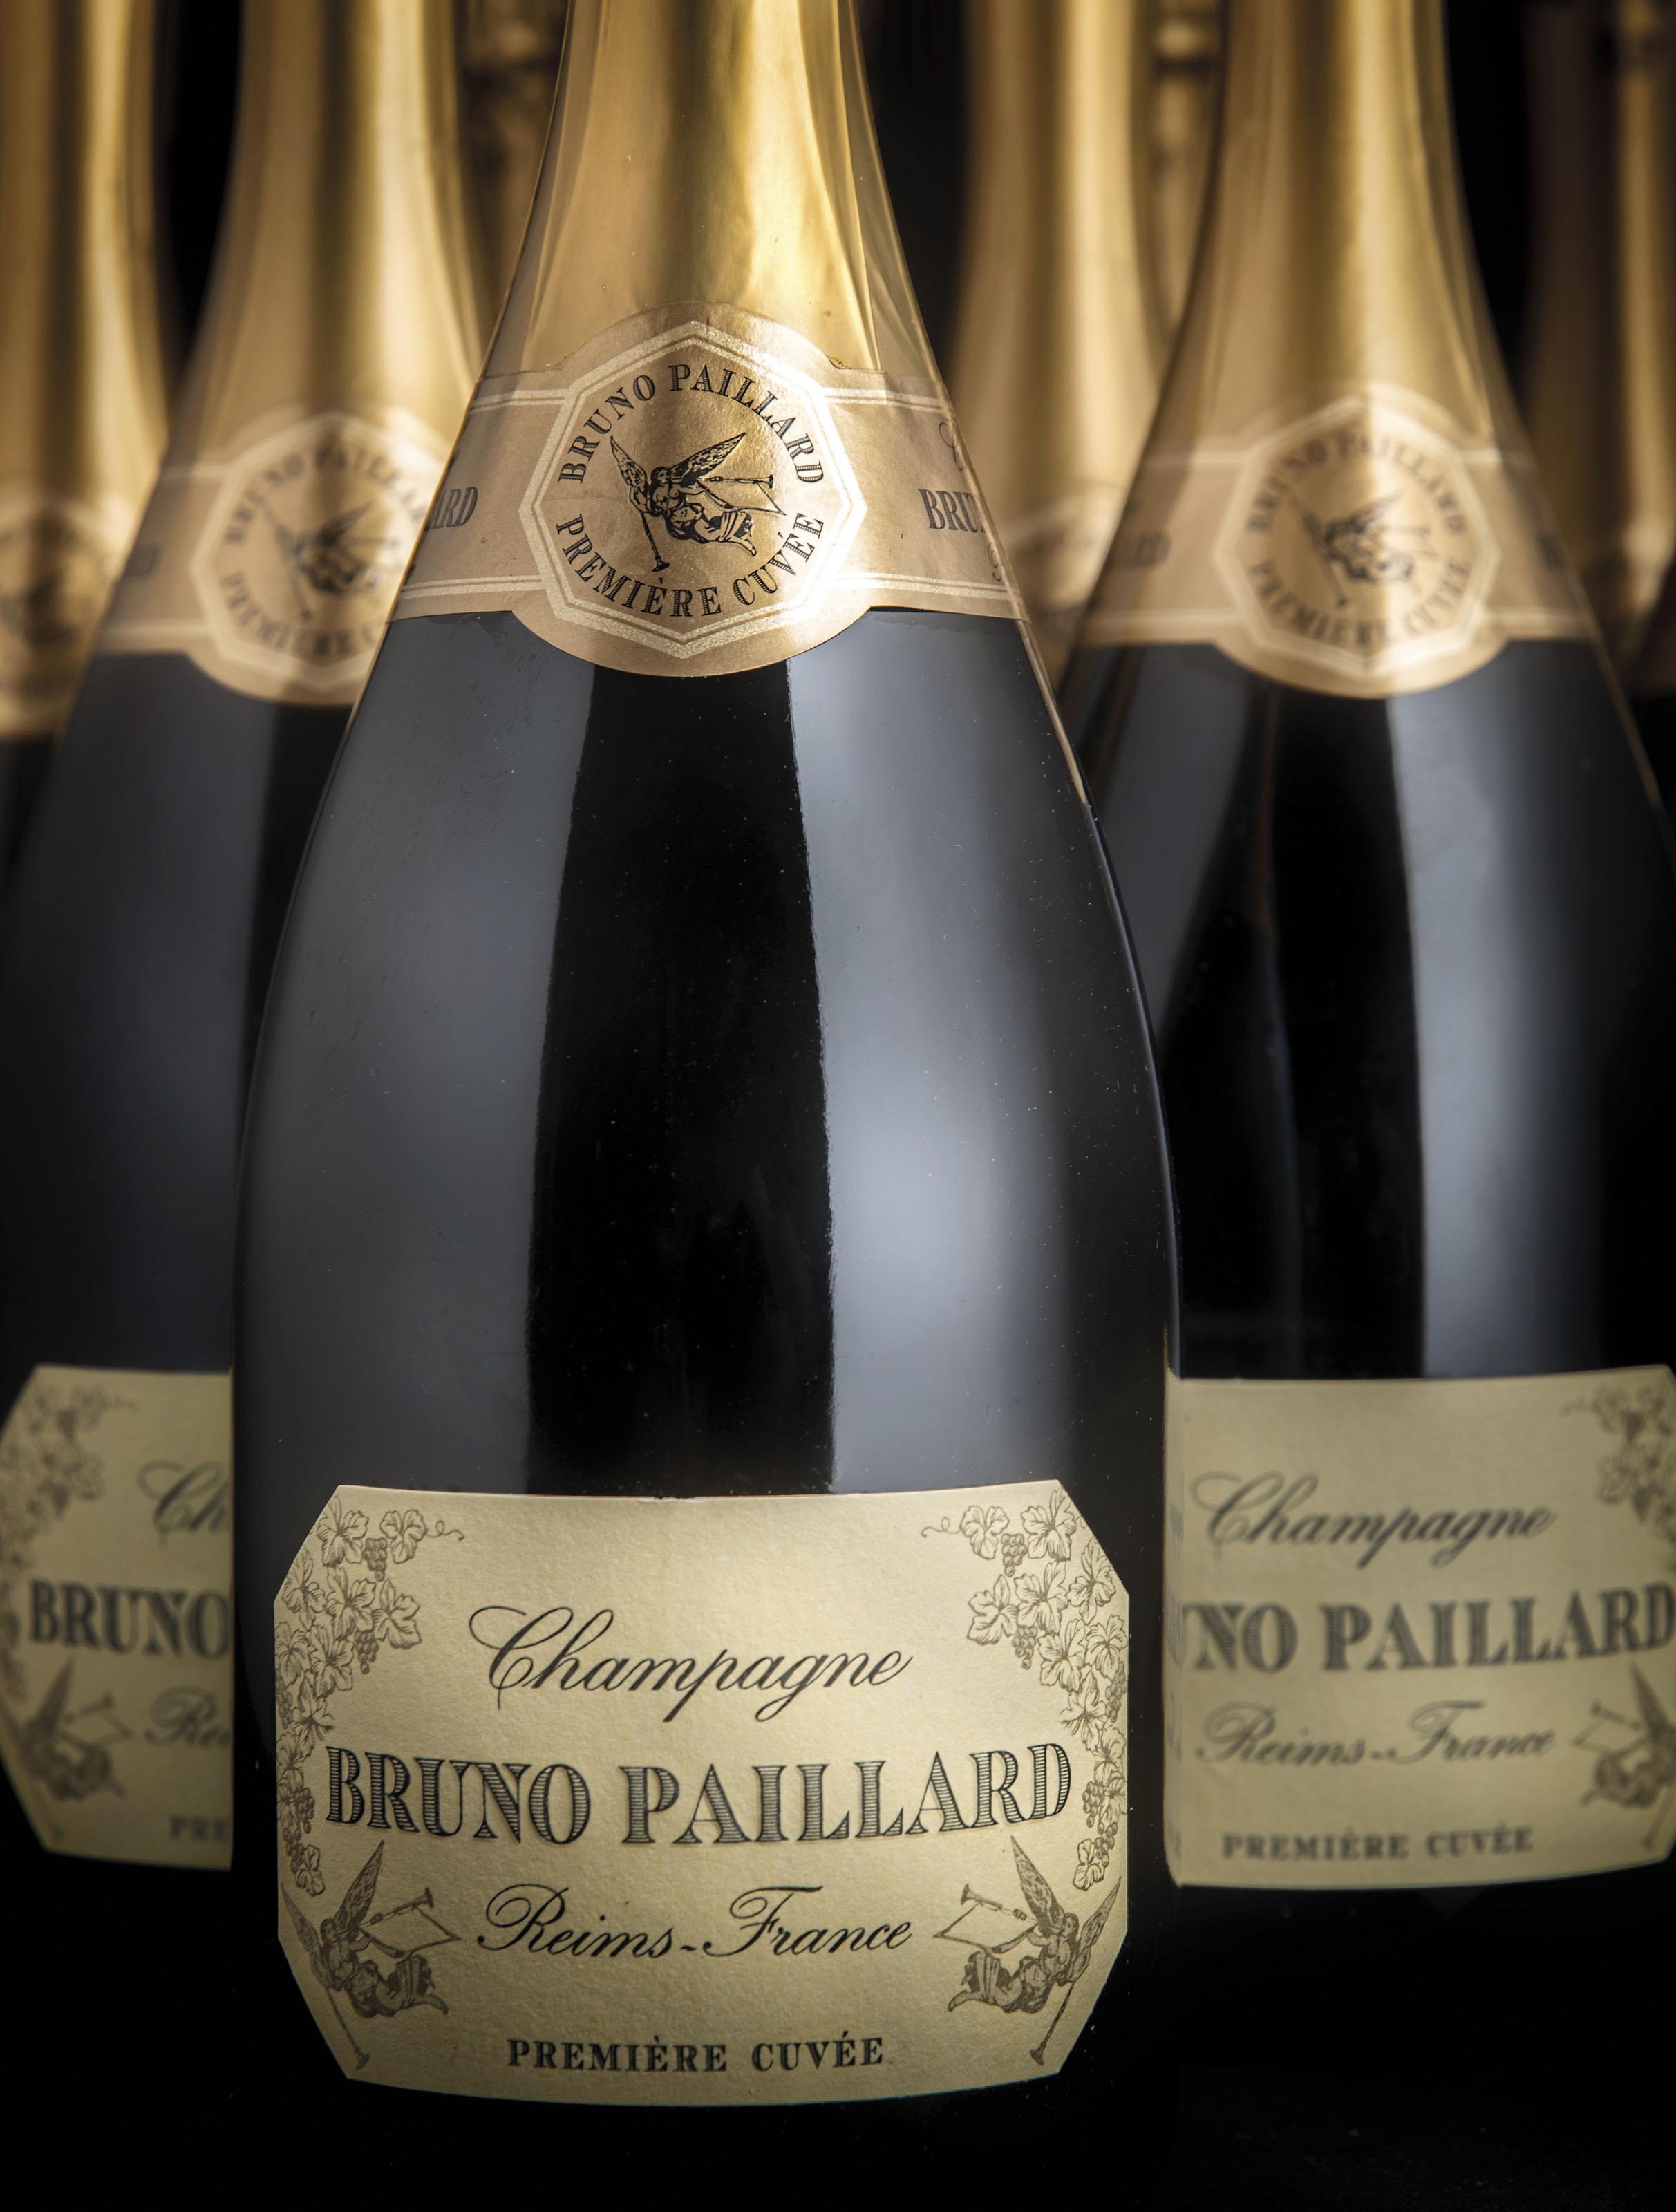 Bruno Paillard Première Cuvée  Twelve disgorged bottles November 2016  (1) February 2014  (1) July 2012  (1) February 2010  (1) July 2008  (1) January 2006  (1) October 2004  (1) February 2002  (1) April 2000  (1) September 1998  (1) March 1996  (1) September 1994  (1)